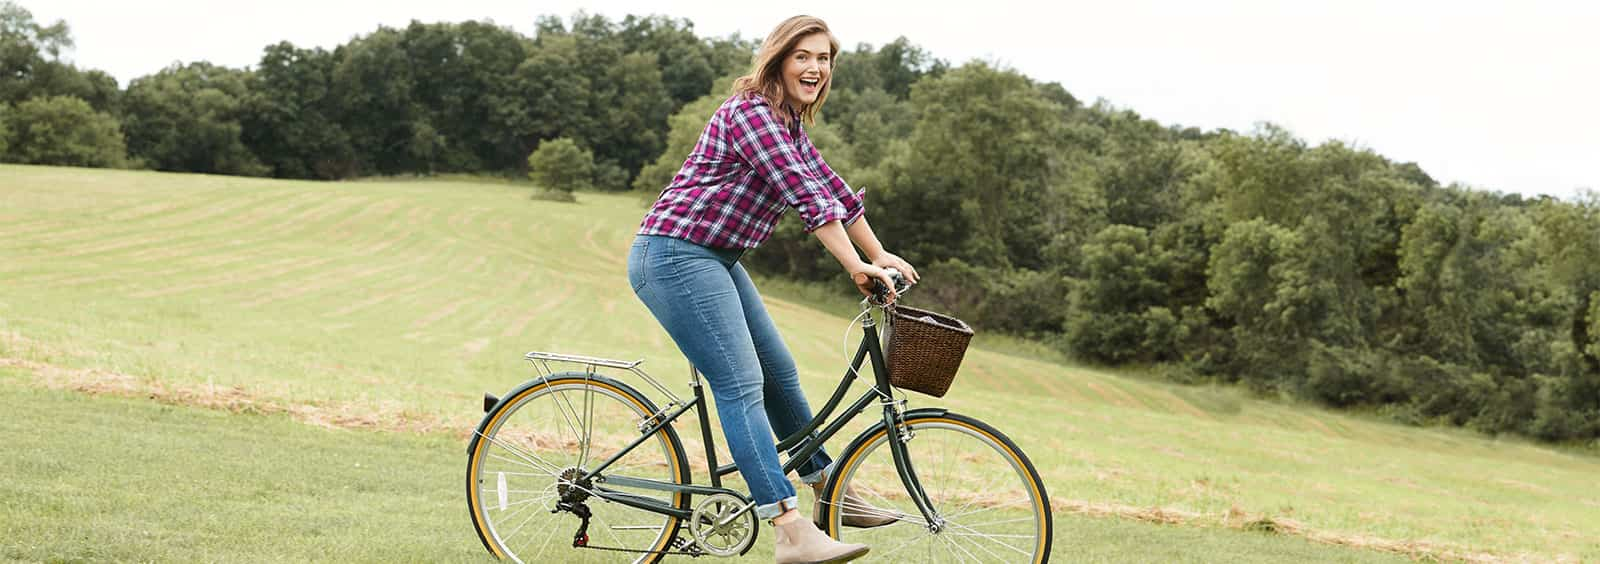 Best Curvy Jeans for Plus Size Women